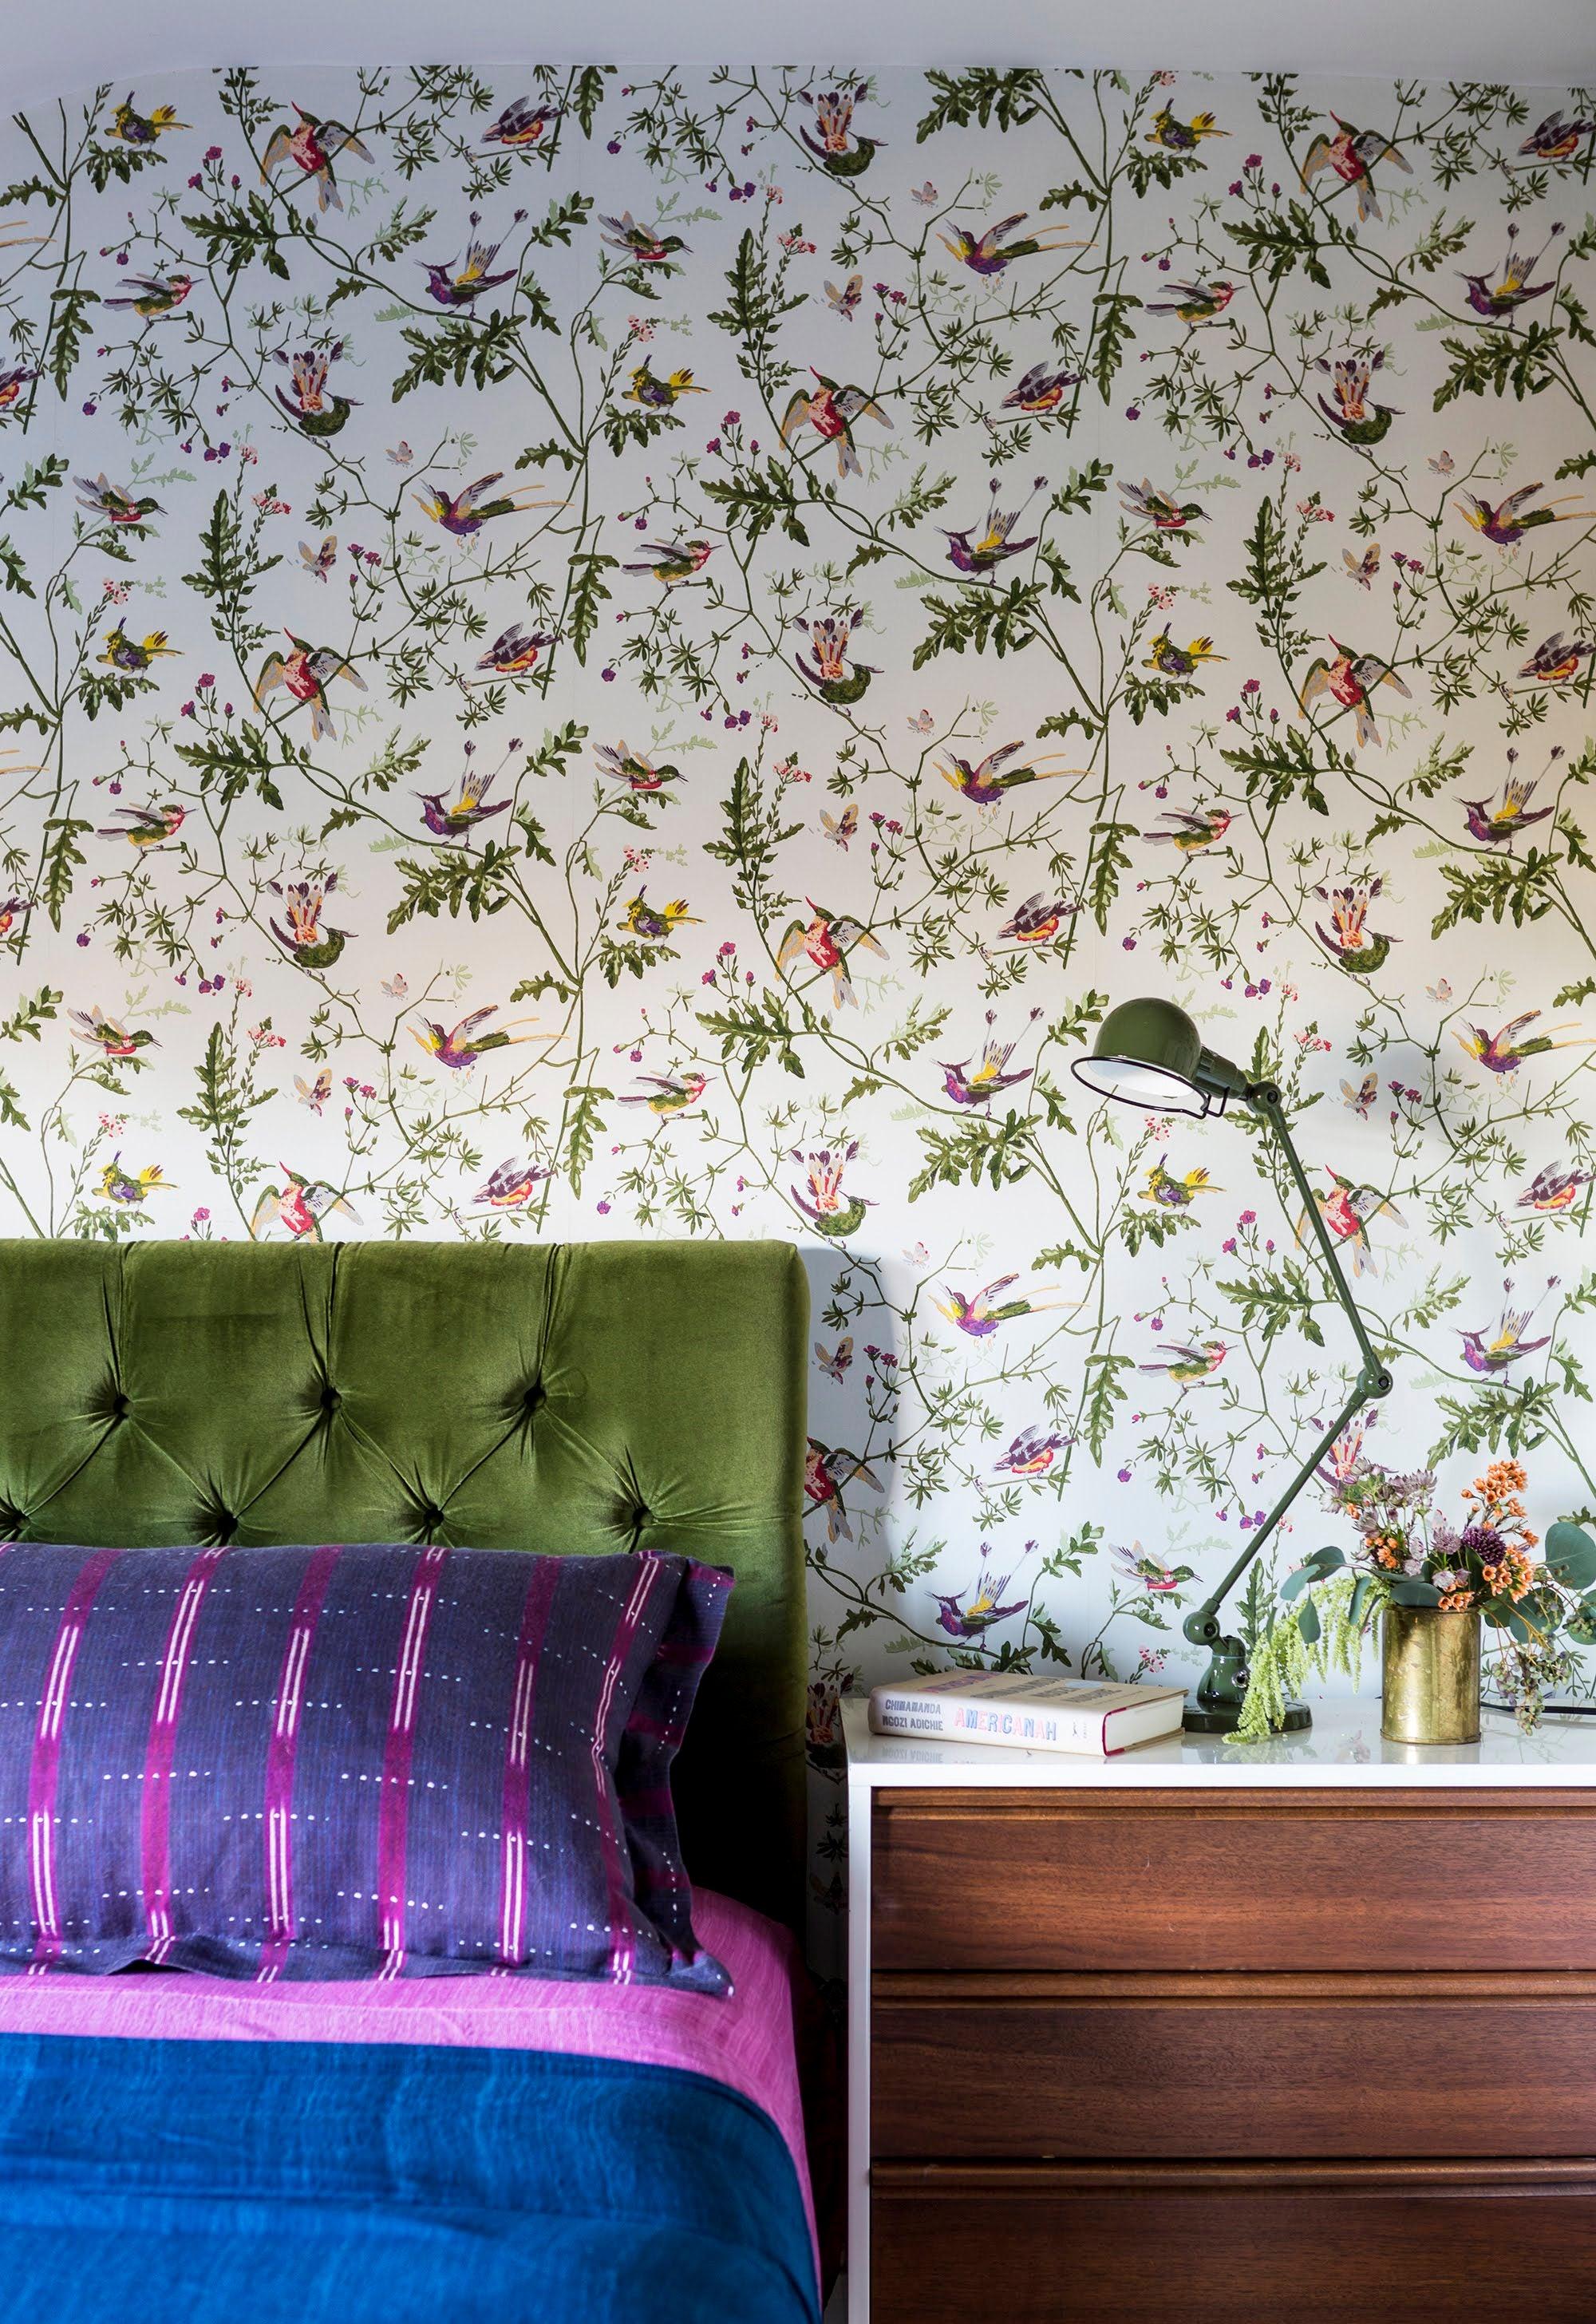 floral-wallpaper-bedroom